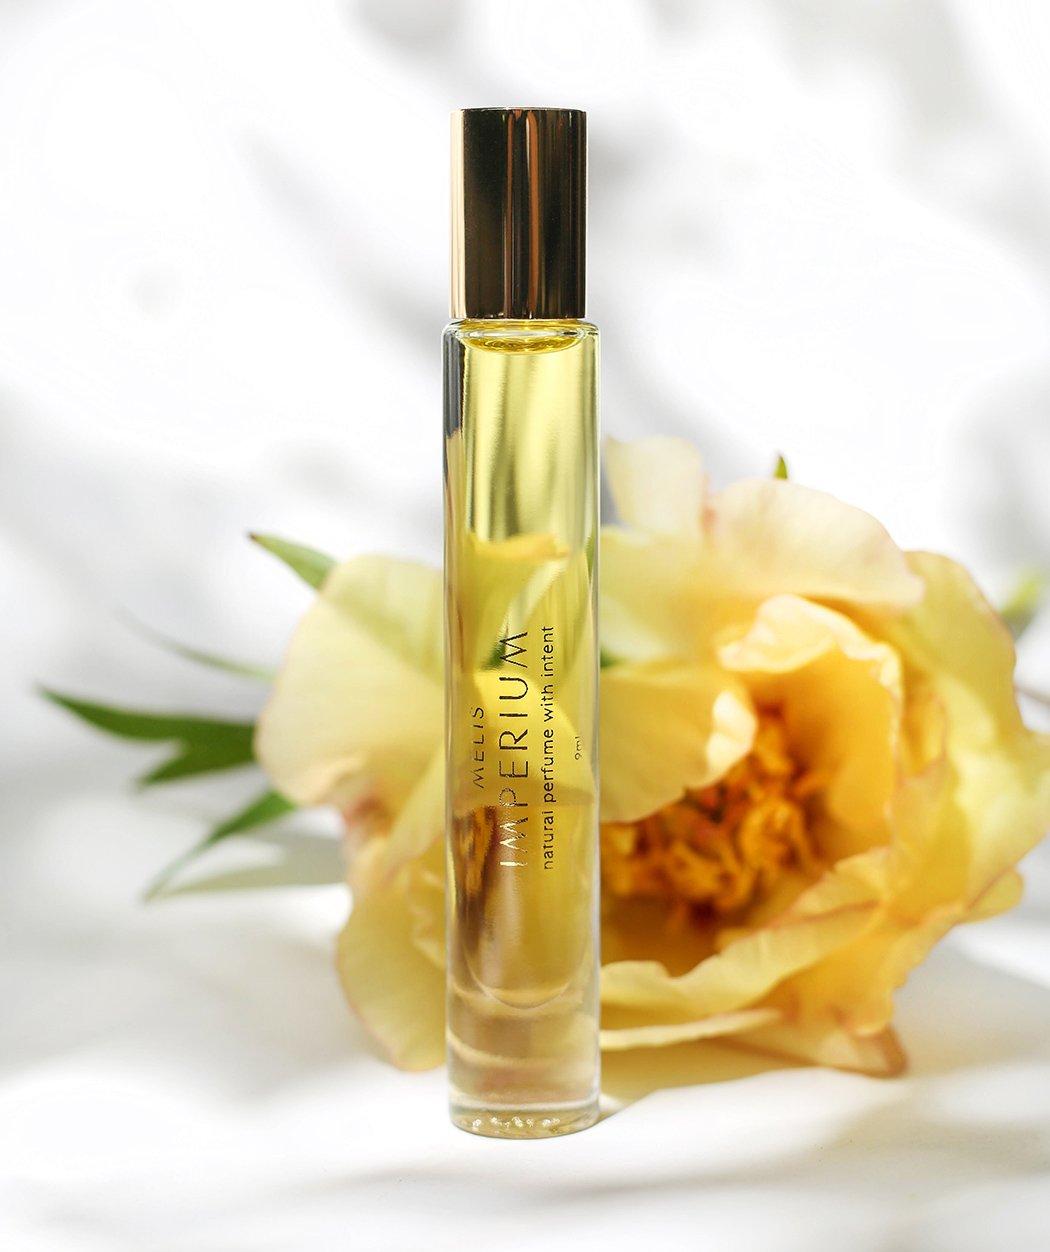 melis-natural-perfume-homepage